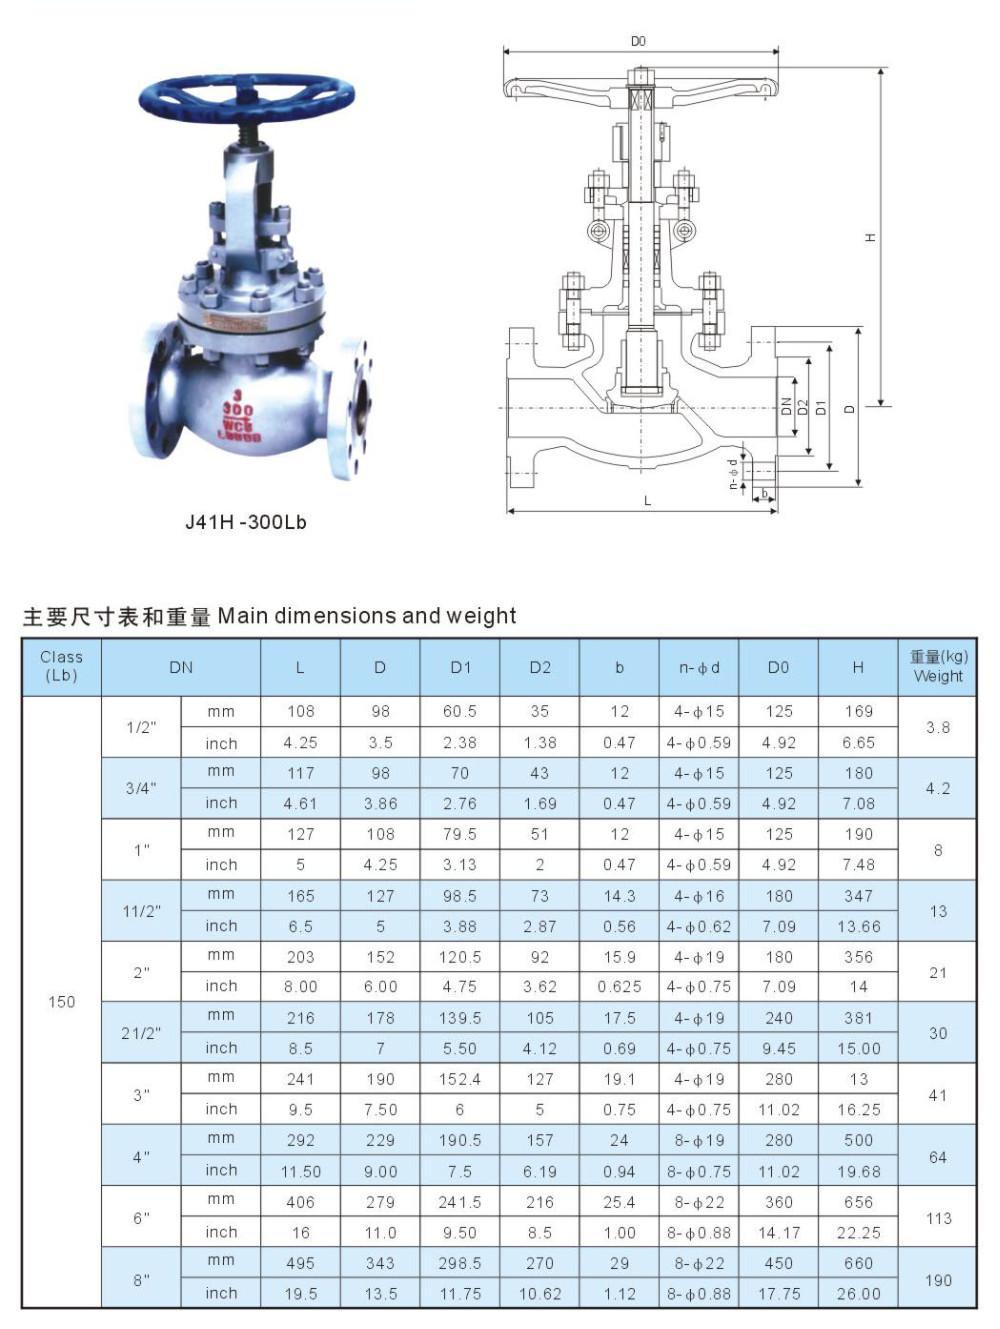 Bride cast steel gate valve